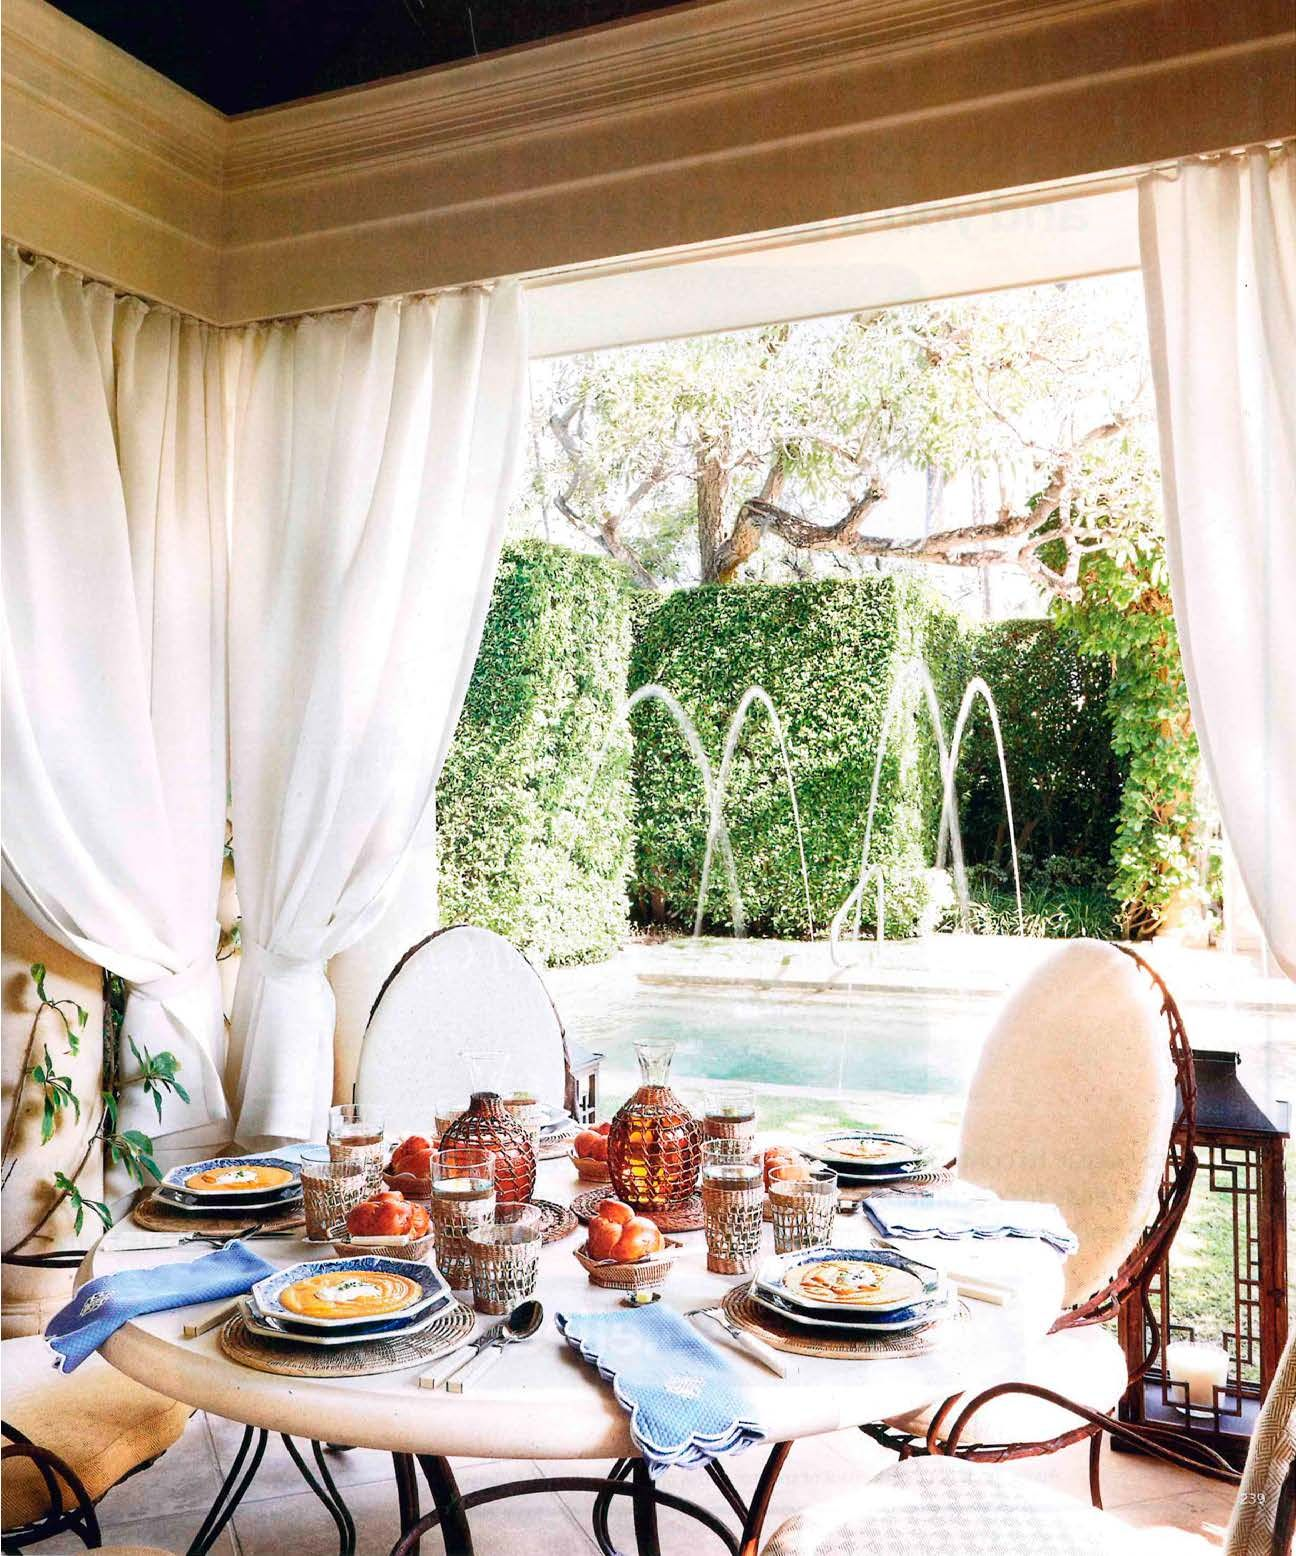 open air dining   Patio design, Outdoor living, Outdoor rooms on Living Spaces Outdoor Dining id=82867